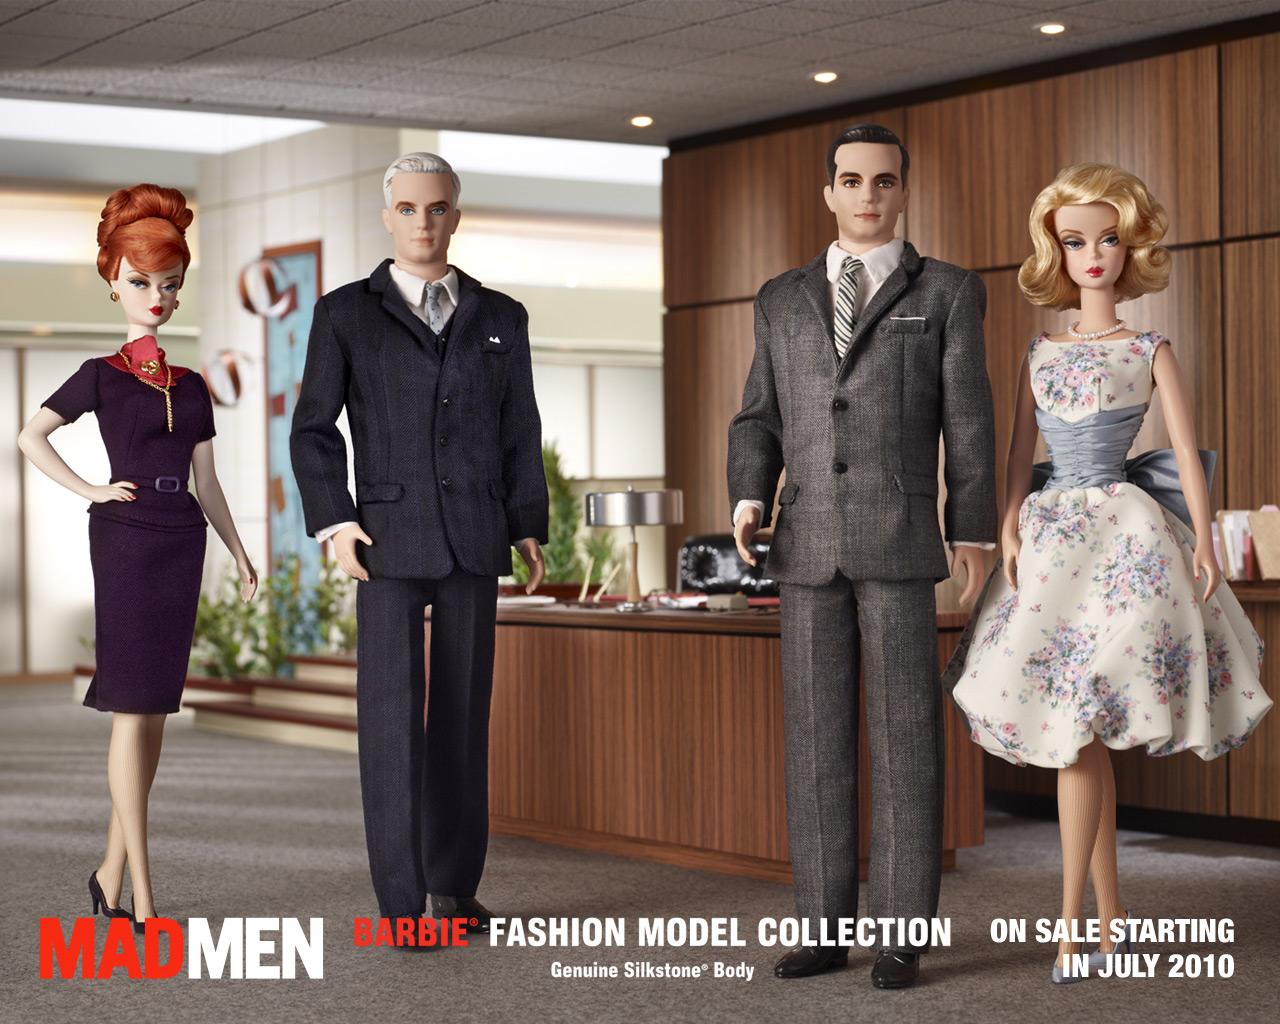 Mad Men Season 6 Wallpapers